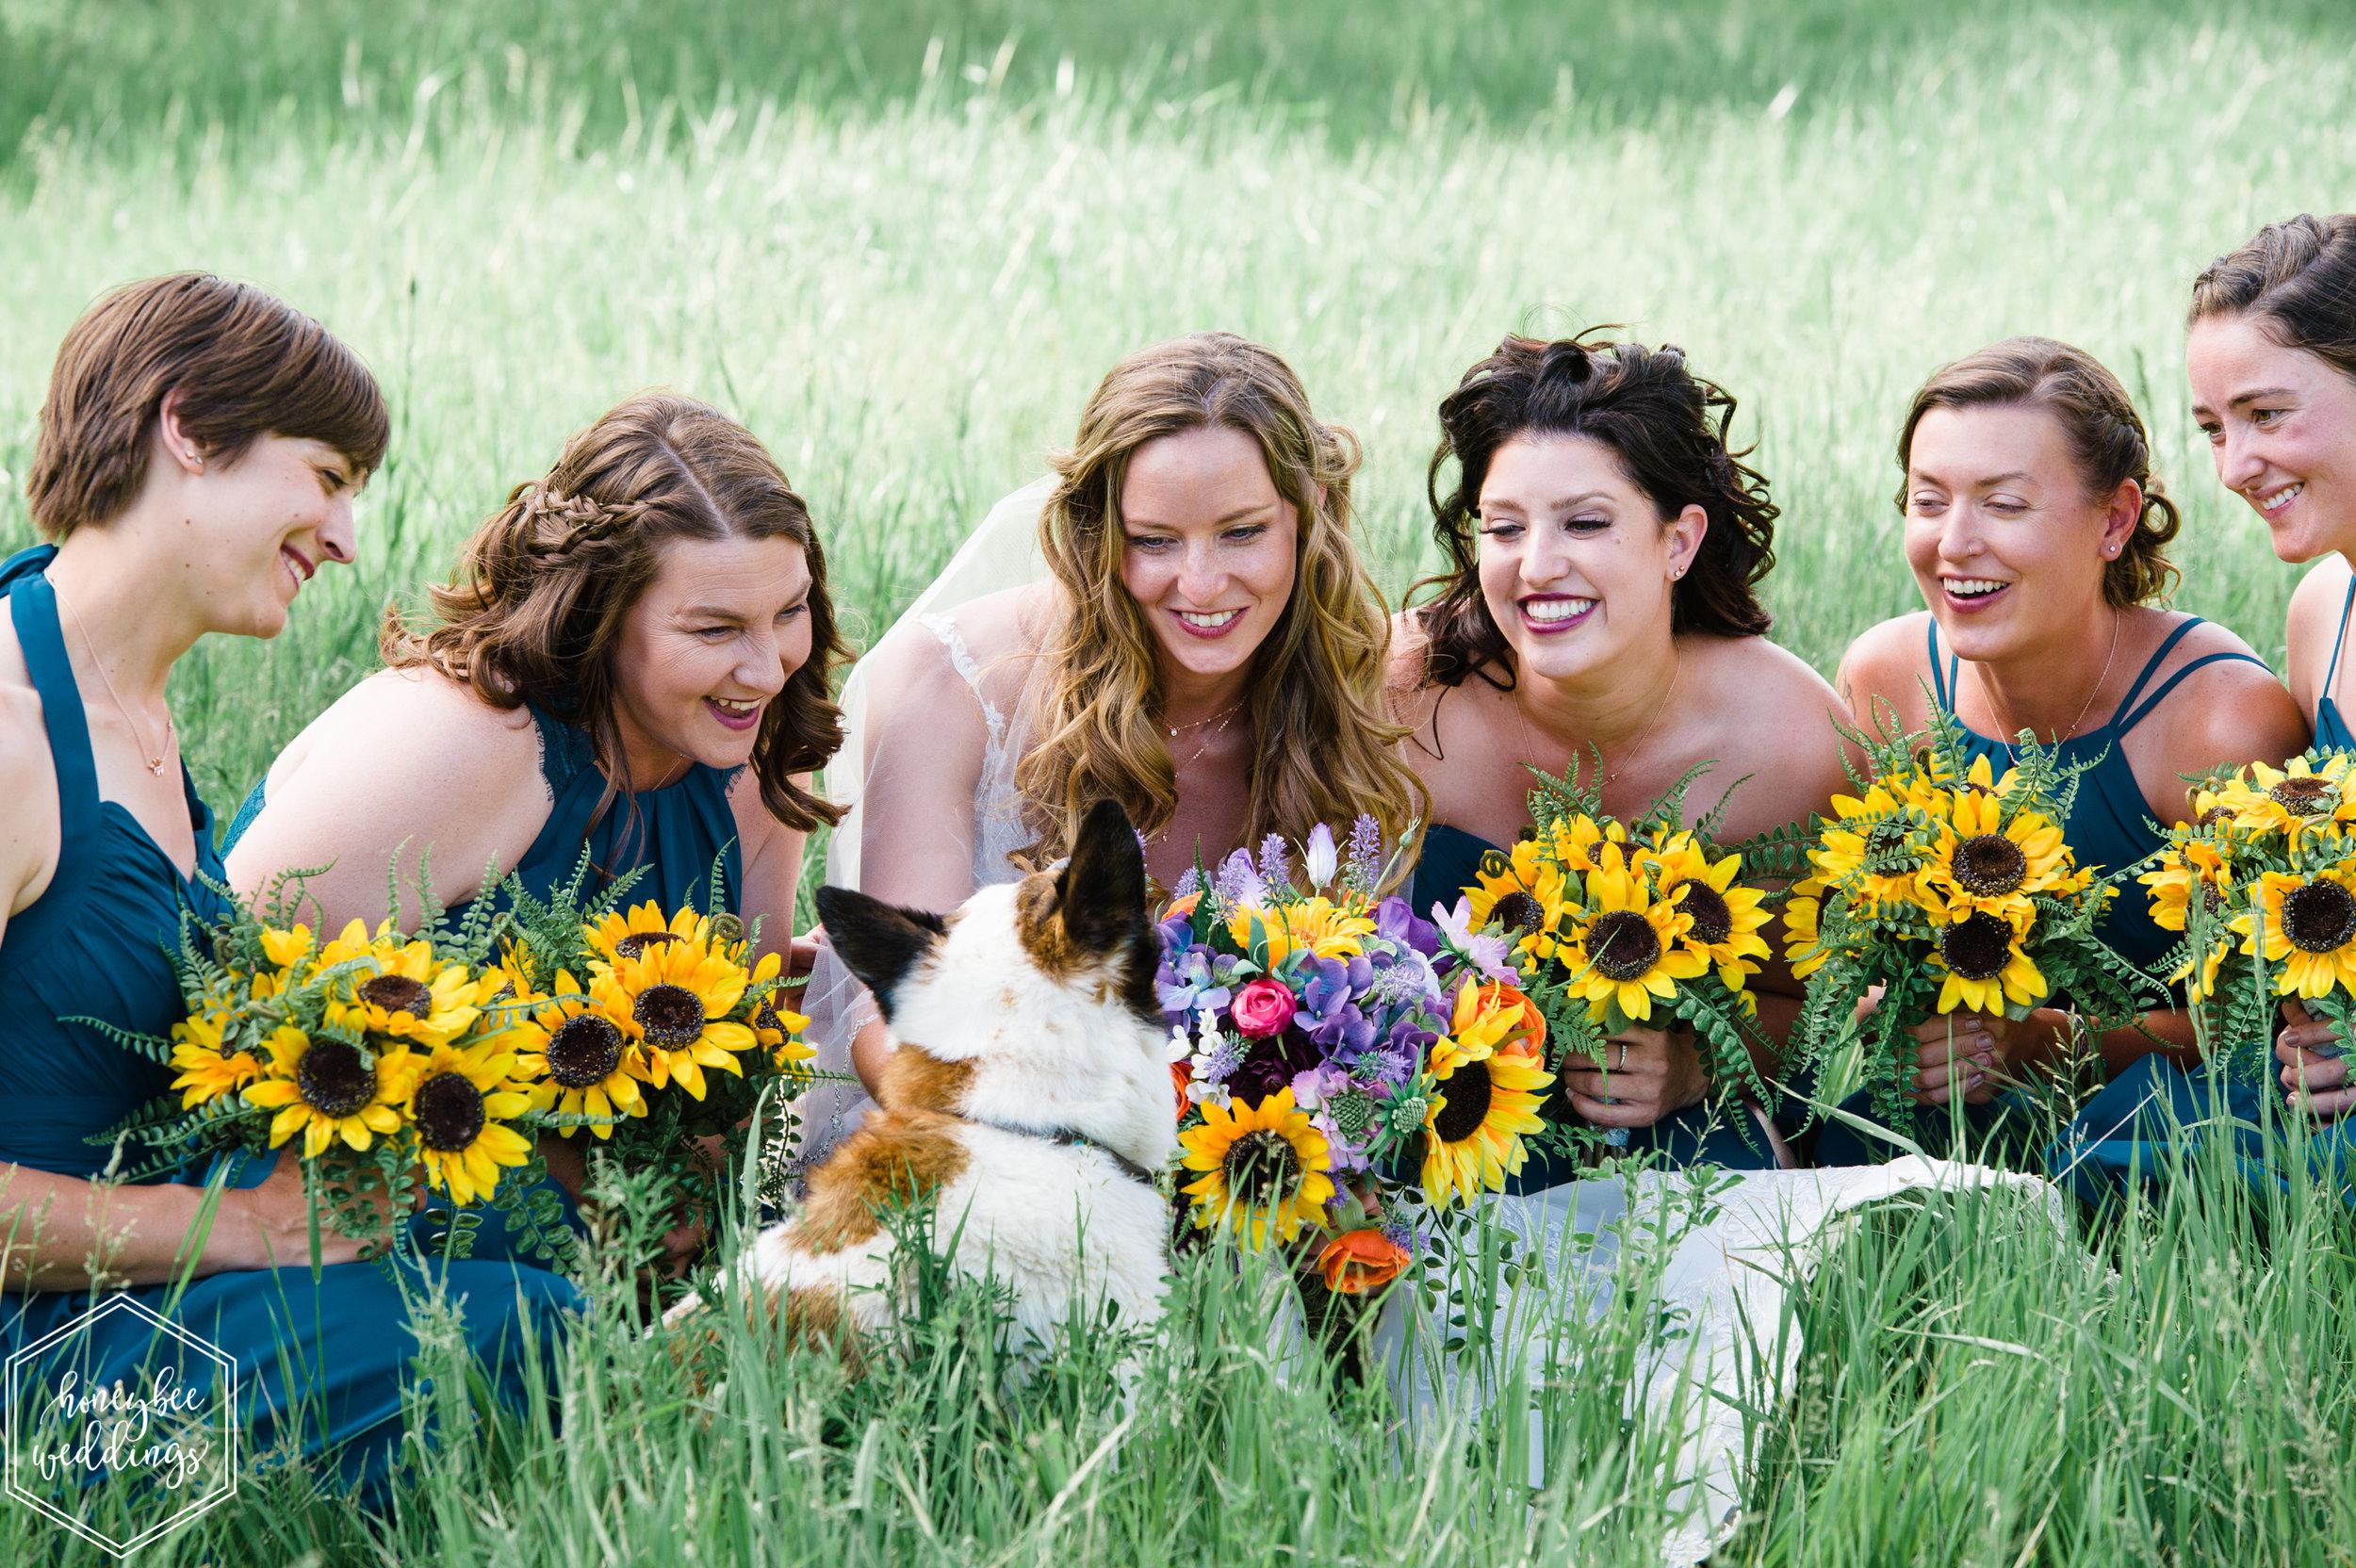 094Yellowstone National Park Wedding_Montana Wedding Photographer_Honeybee Weddings_Shannon & Jonathan_June 29, 2019-2562.jpg